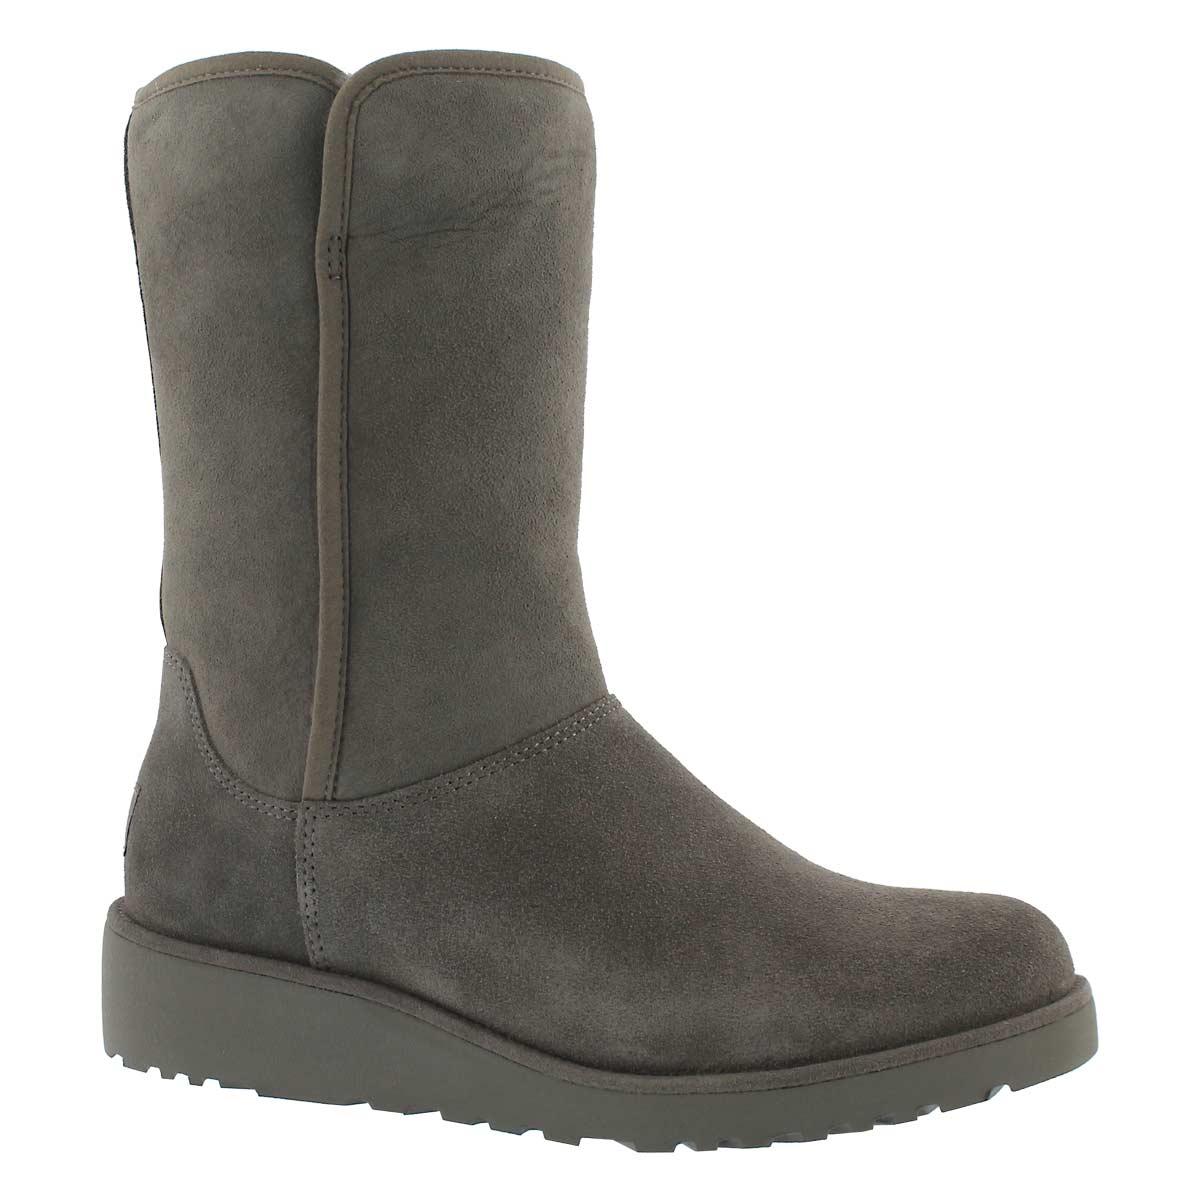 Women's AMIE grey tall wedge sheepskin boots